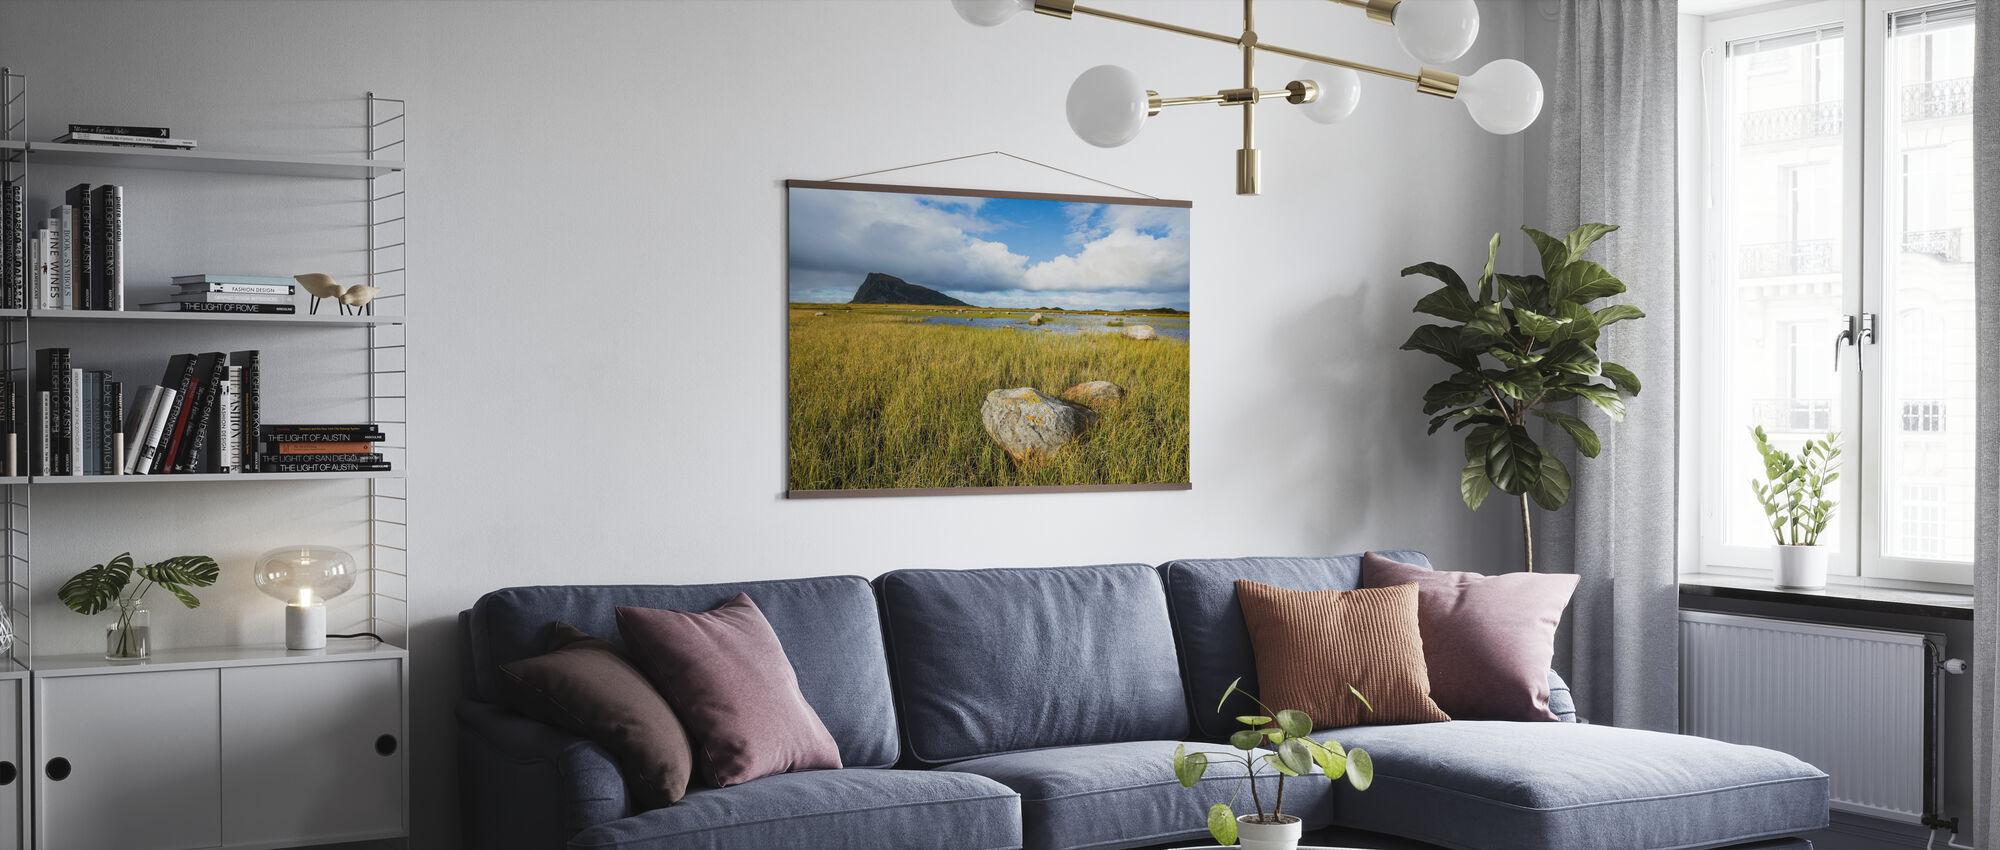 Klippformationer i gräsbevuxen kustlinje, Norge - Poster - Vardagsrum